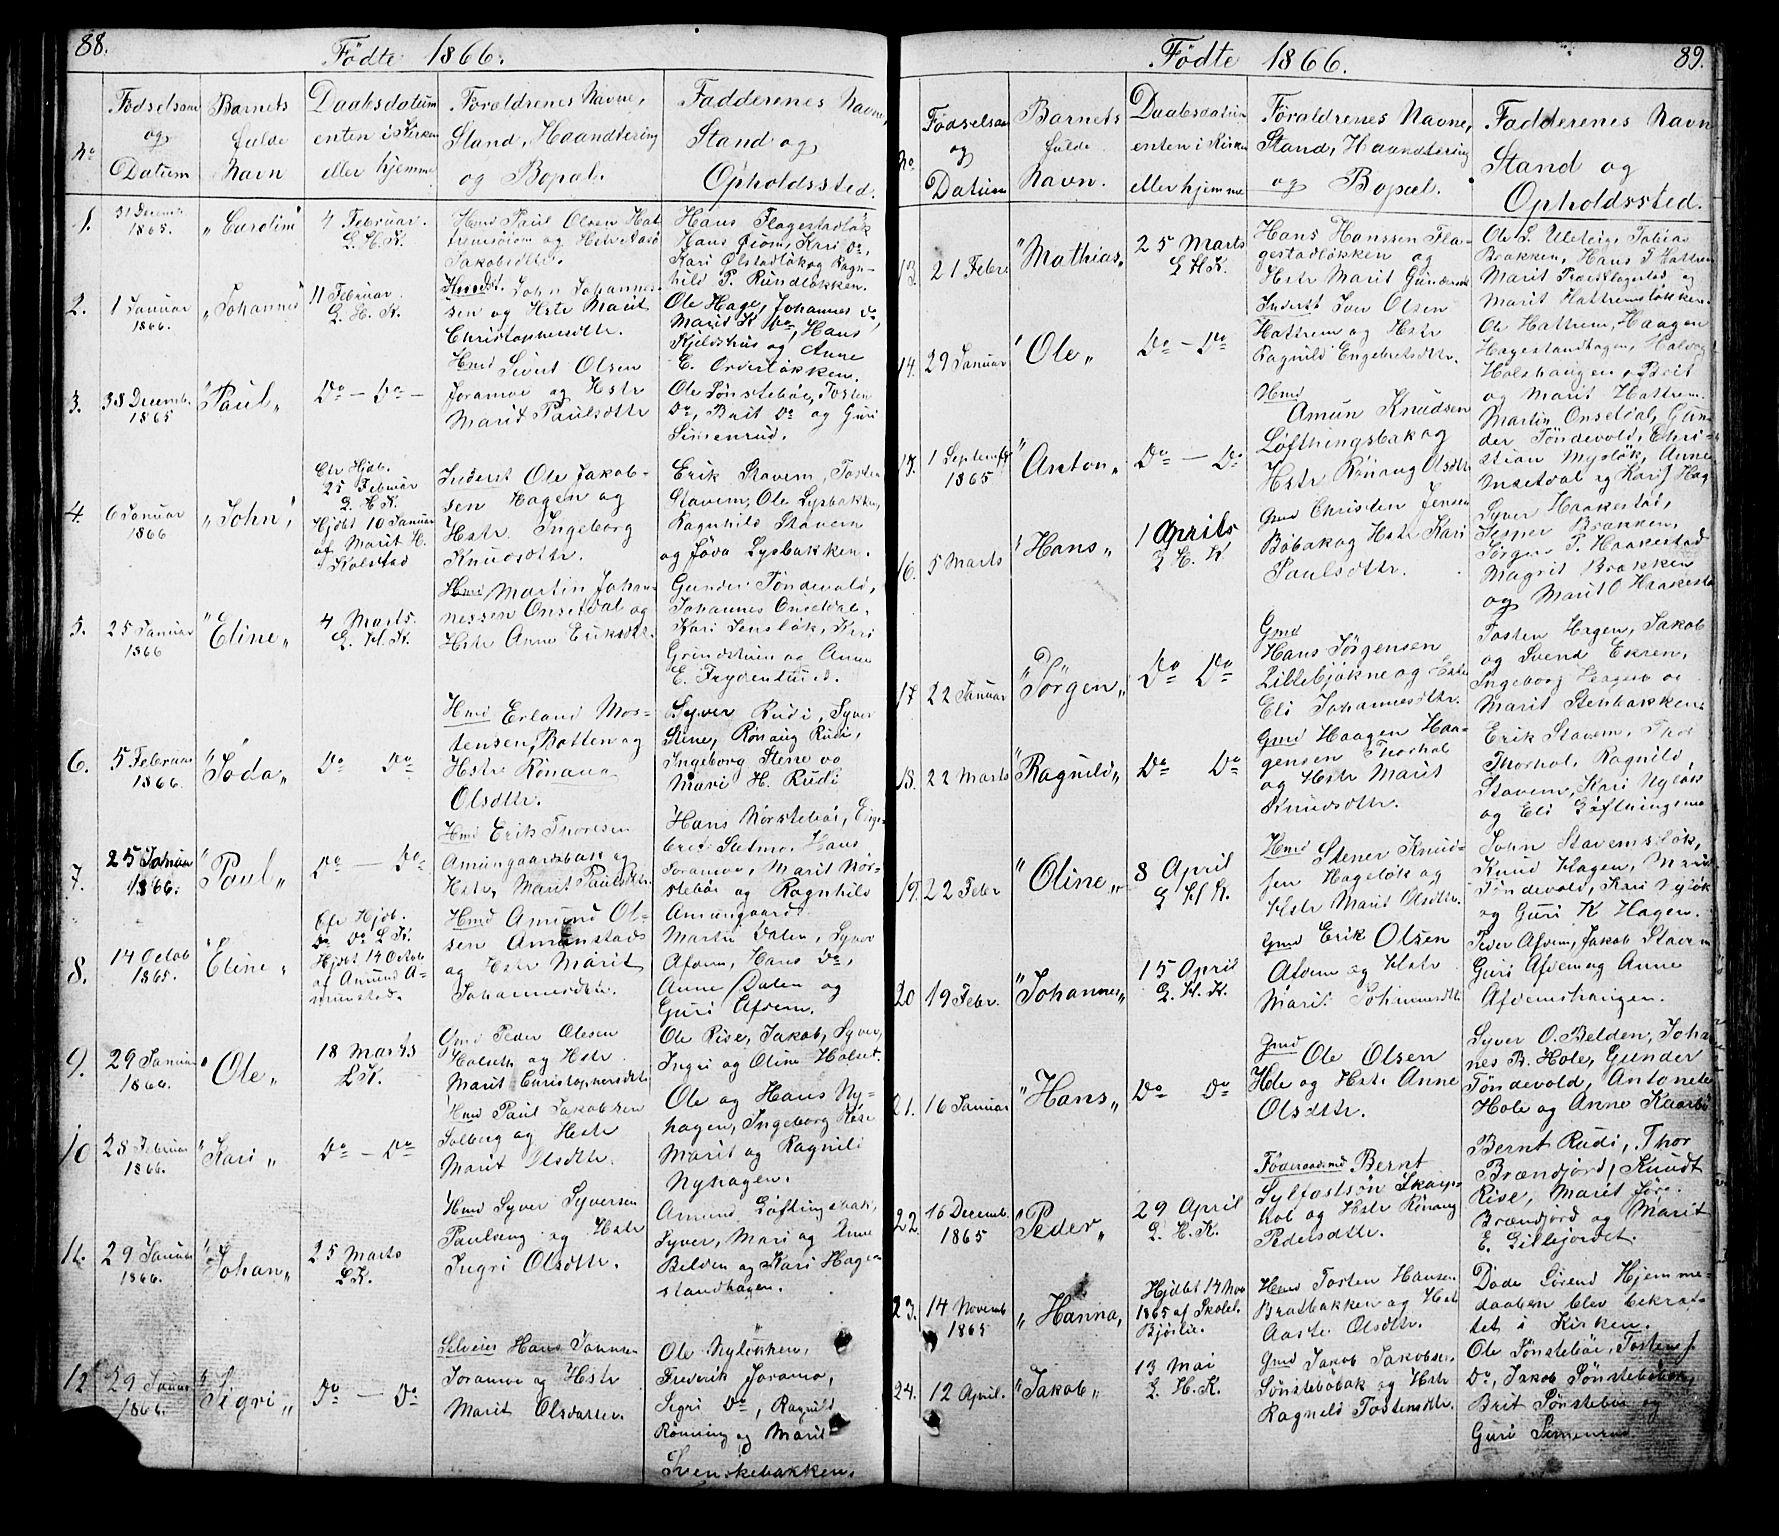 SAH, Lesja prestekontor, Klokkerbok nr. 5, 1850-1894, s. 88-89